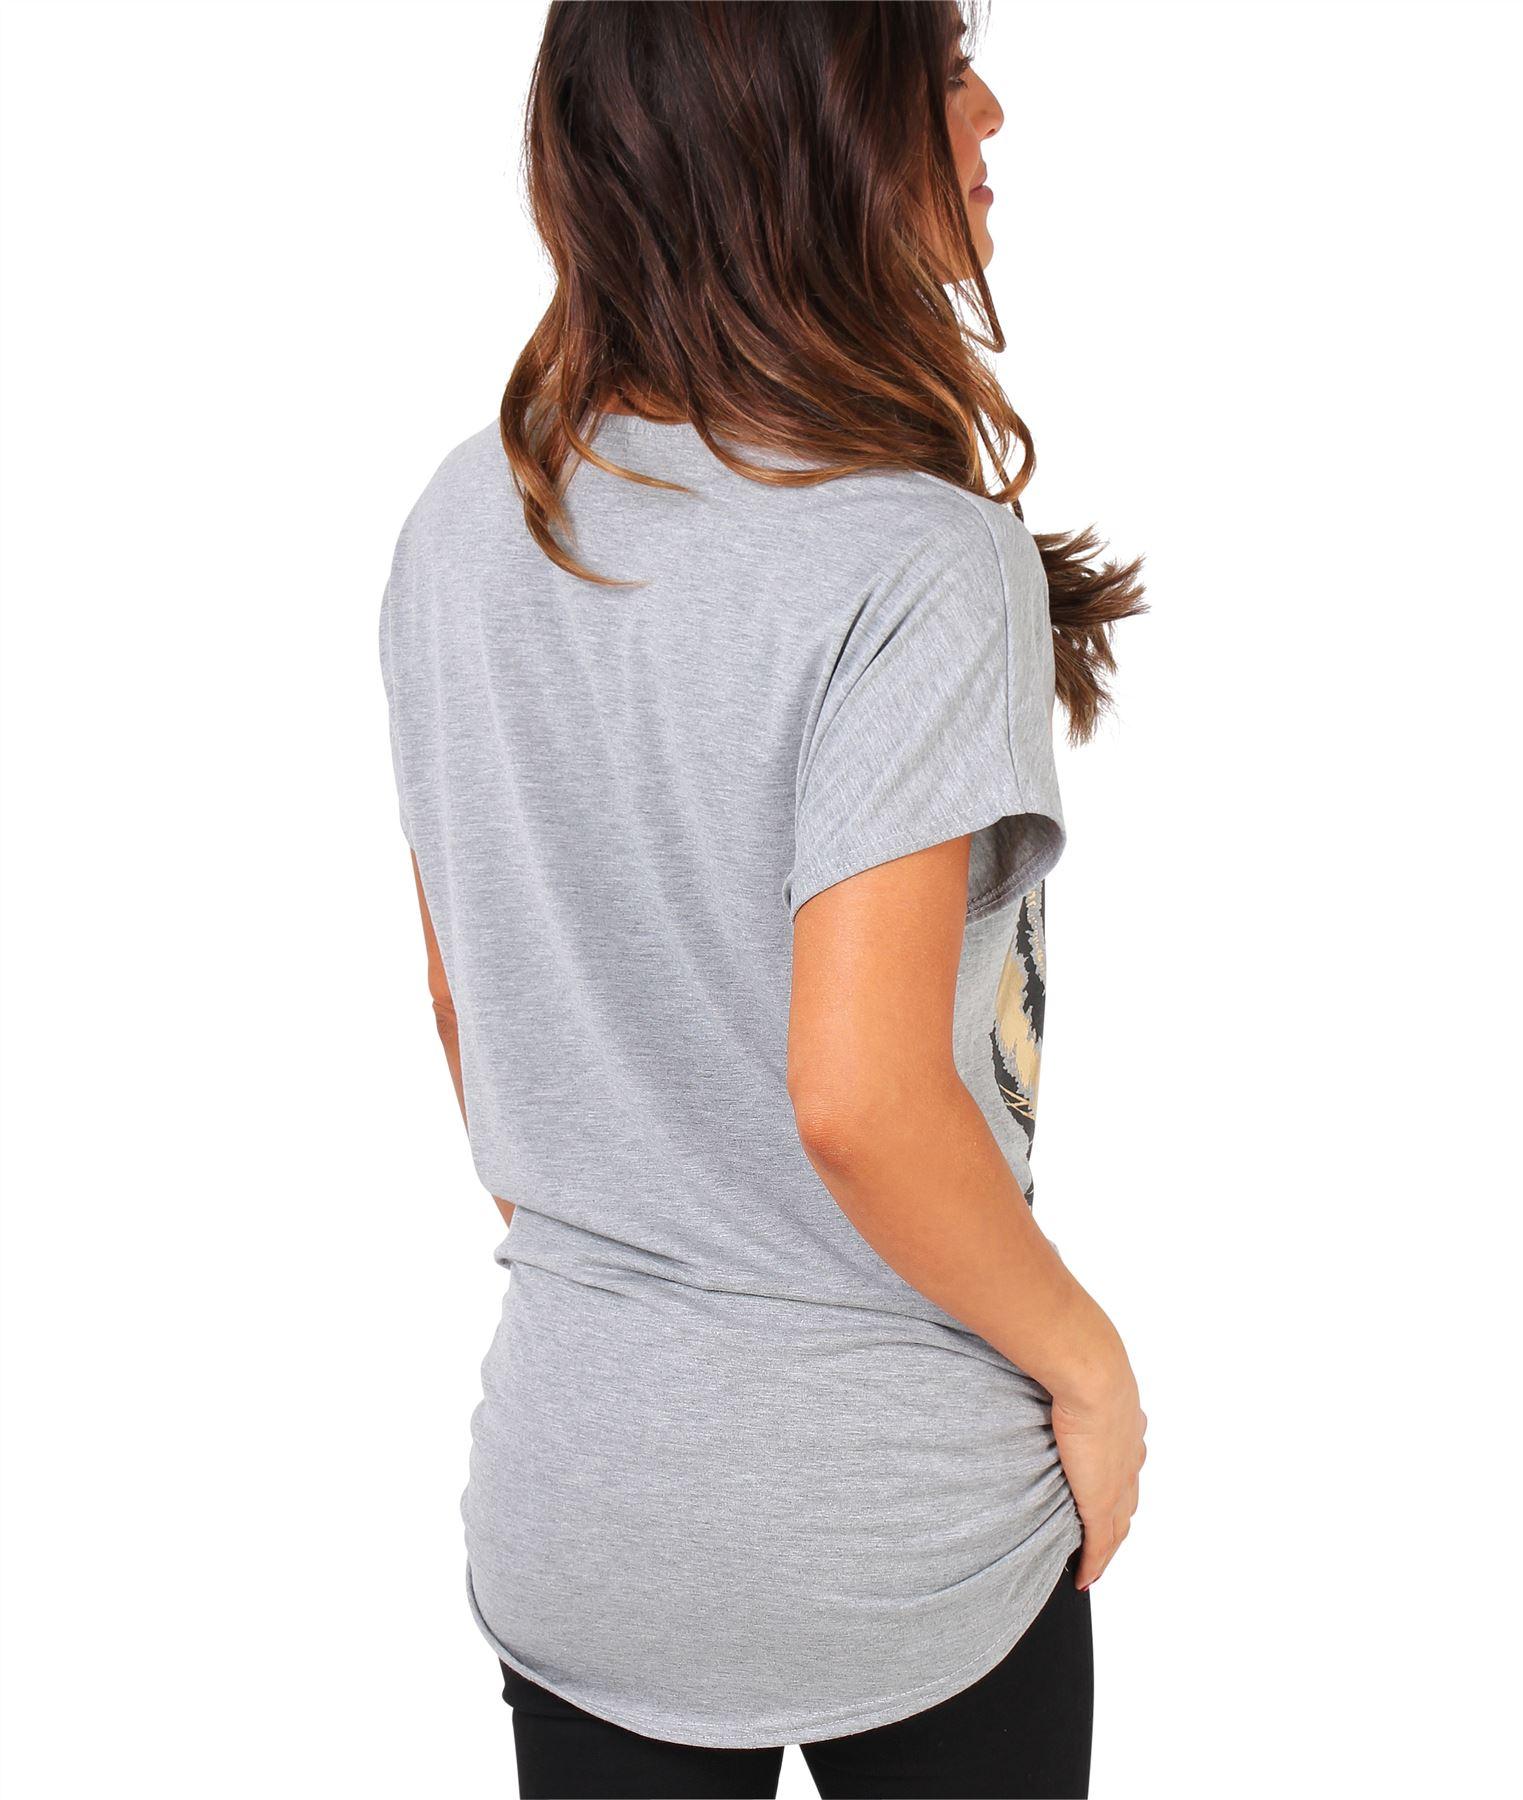 Womens-Oversized-Batwing-T-Shirt-Ladies-Baggy-Animal-Tiger-Blouse-Print-Top thumbnail 11